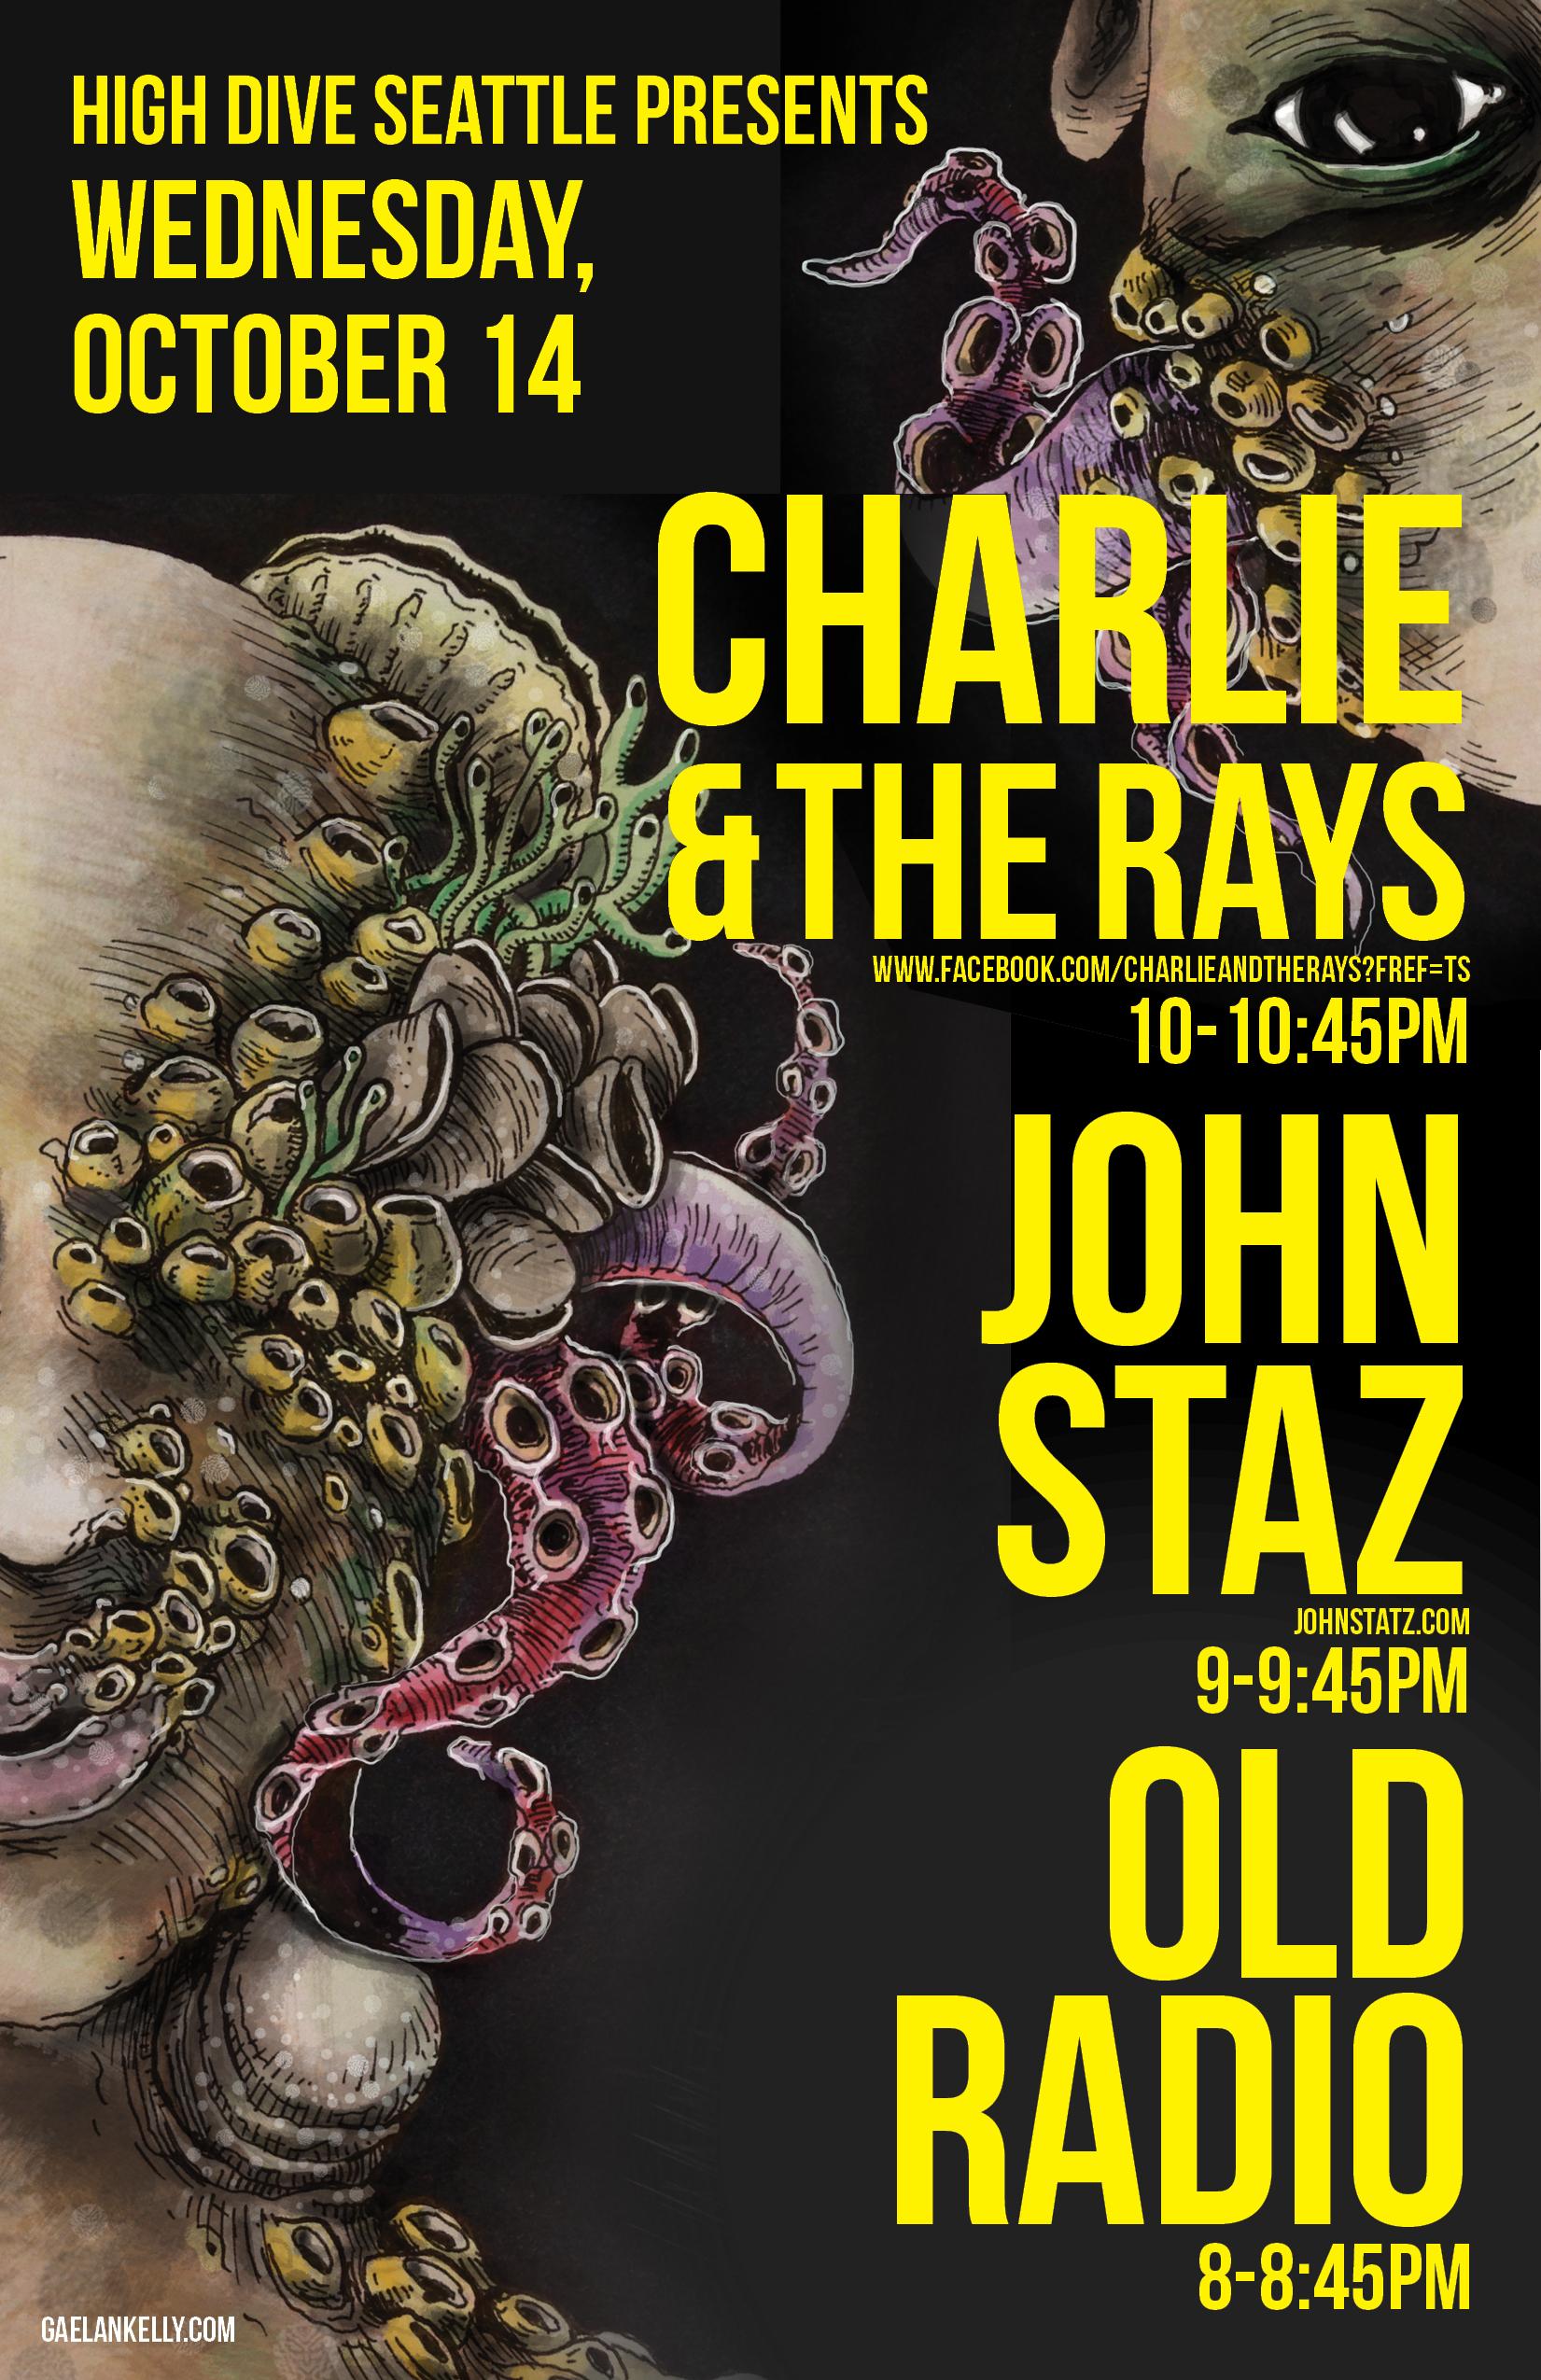 Old Radio Poster Sept 2015.jpg